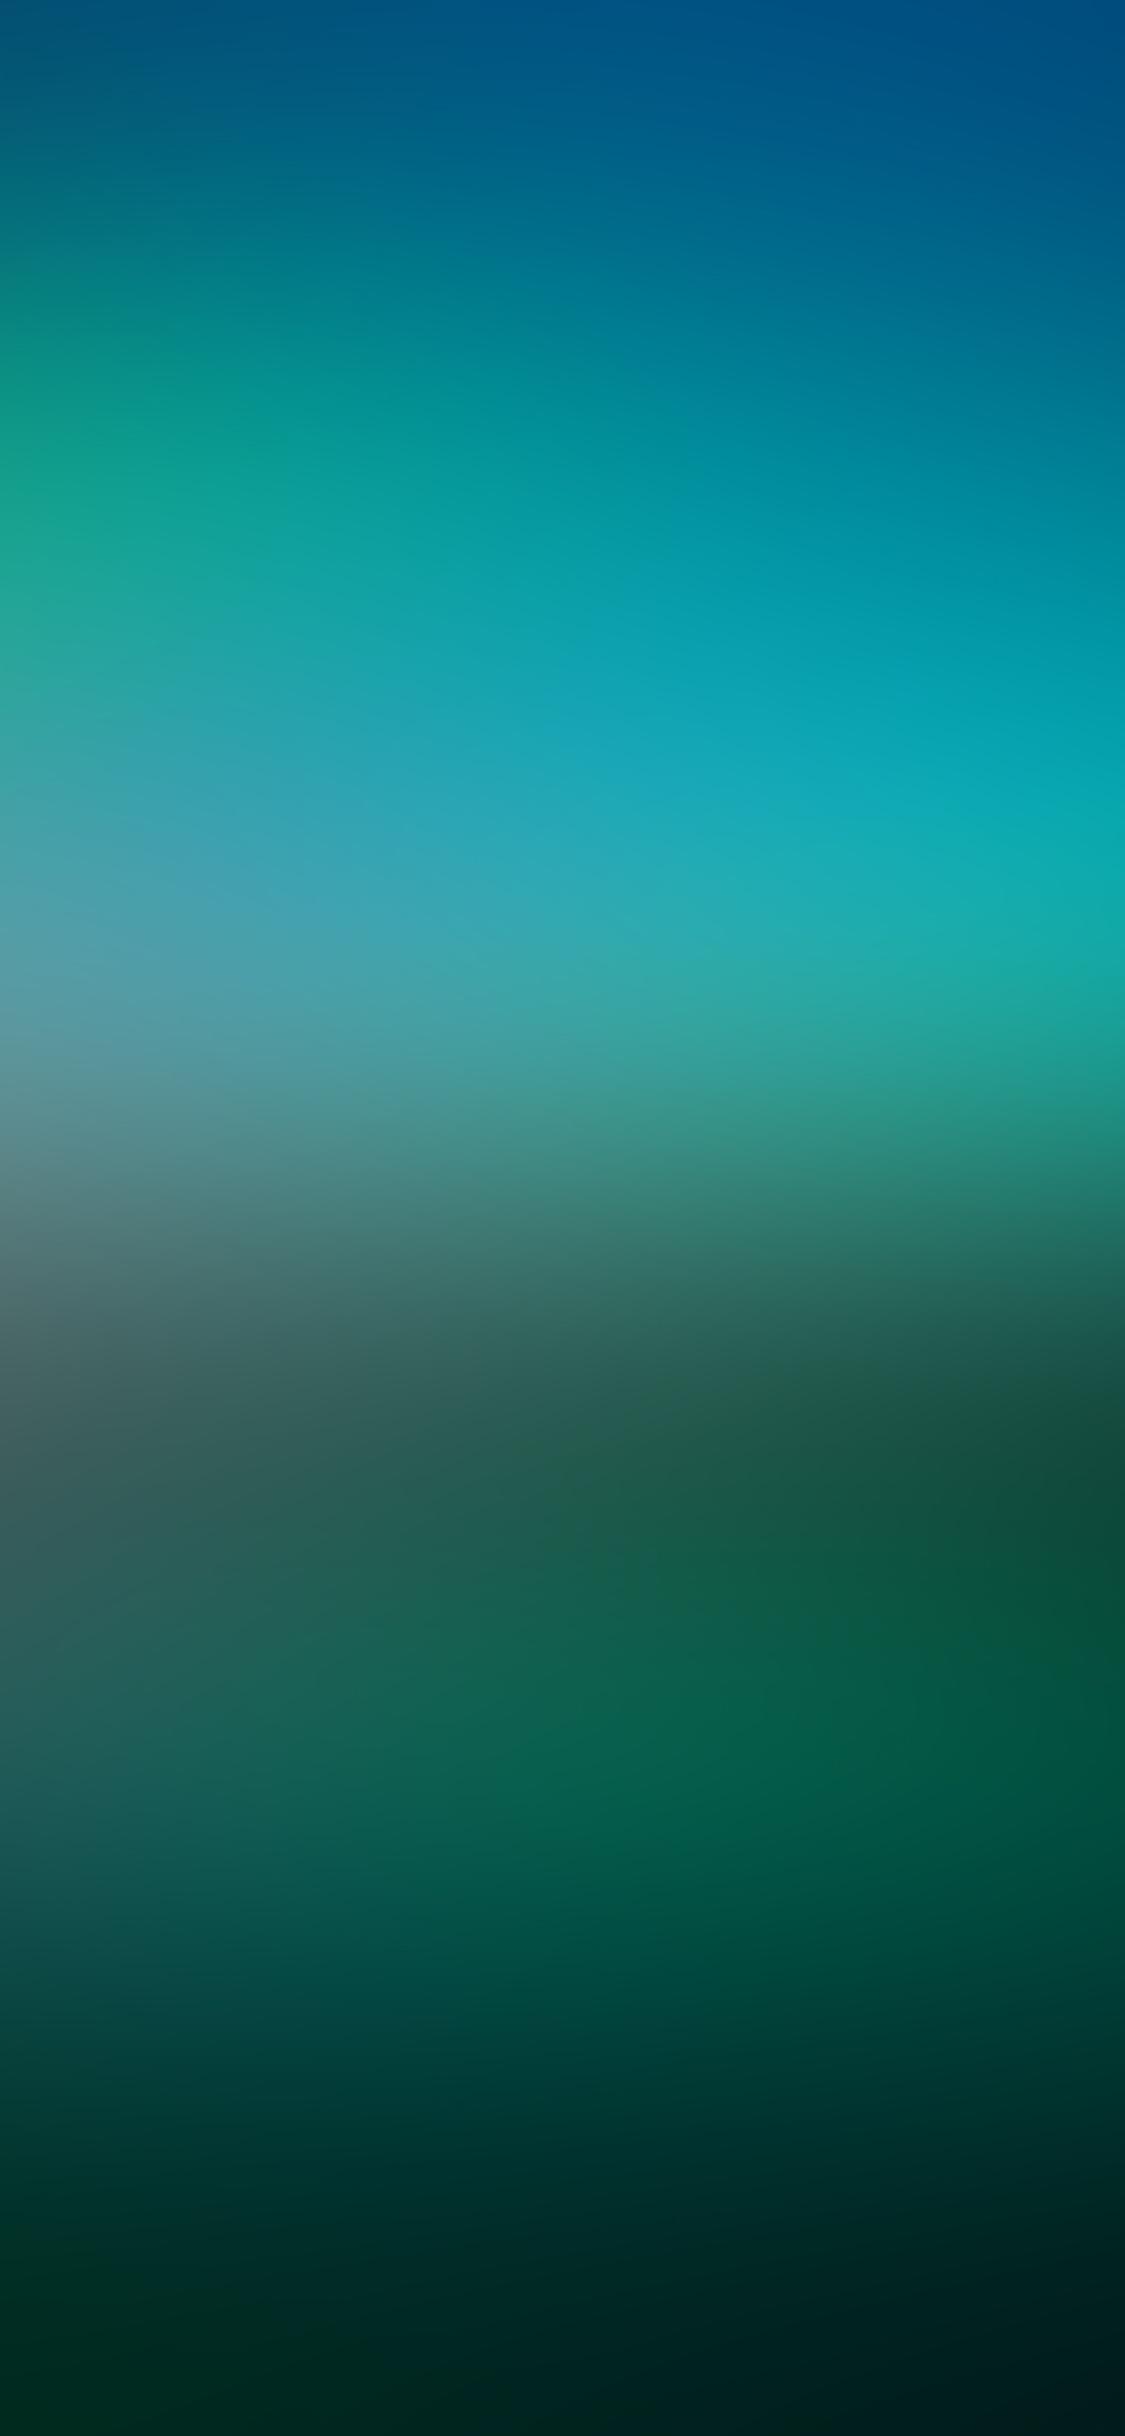 iPhoneXpapers.com-Apple-iPhone-wallpaper-sj14-greeb-blue-shek-burger-blur